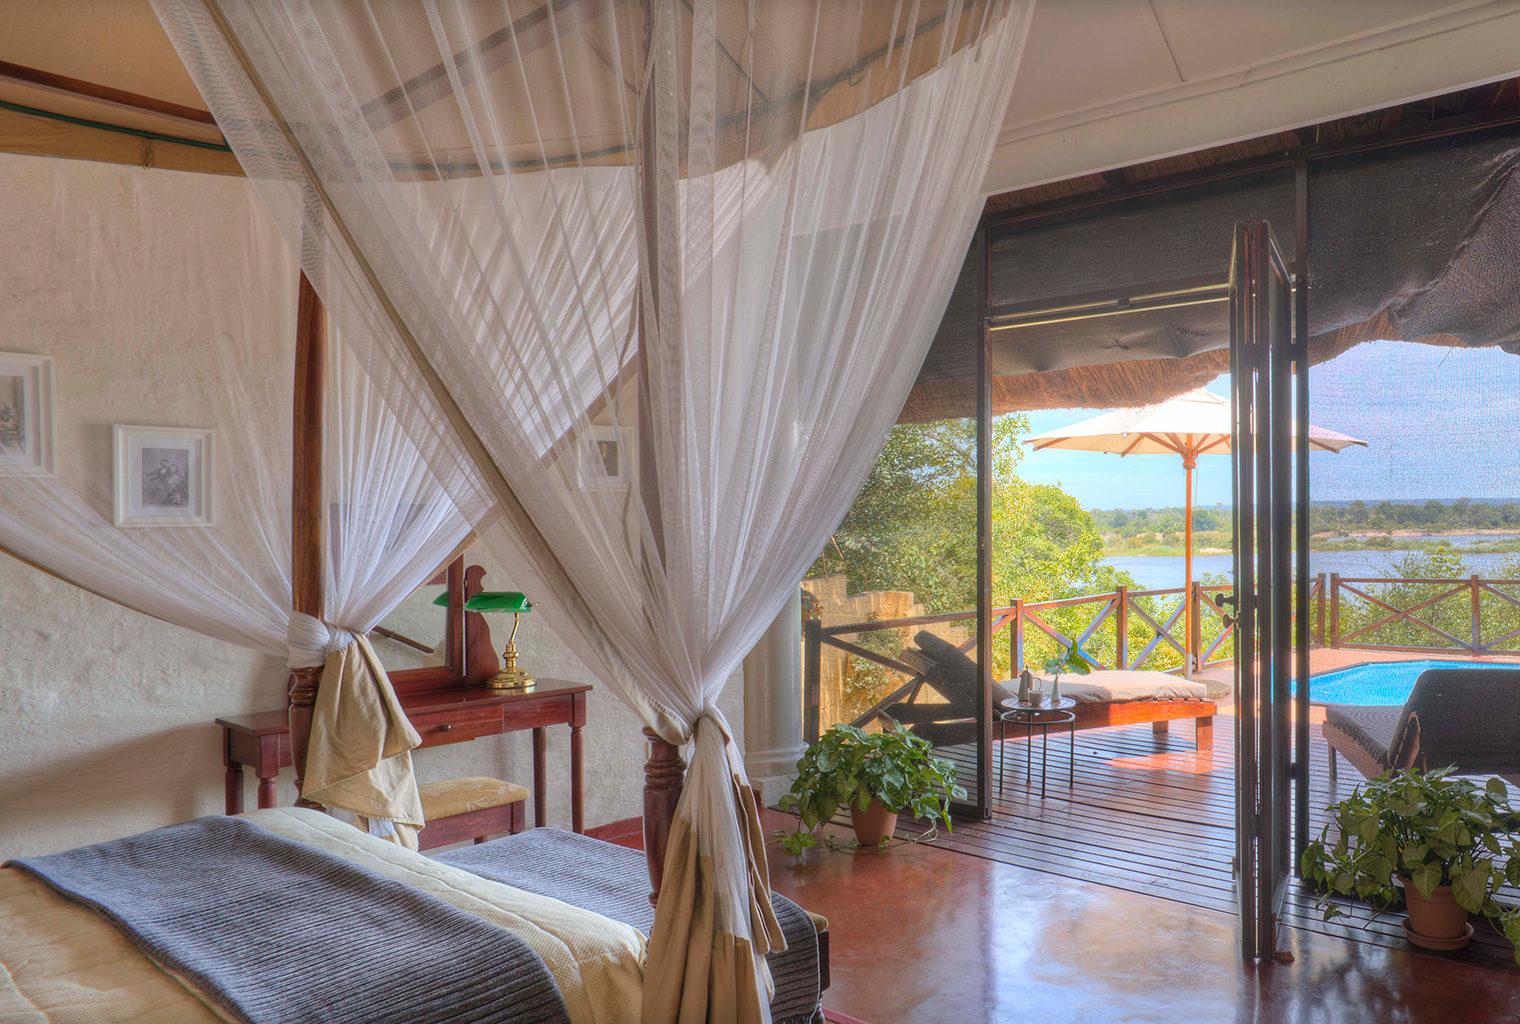 The-River-Club-Lodge-Zambia-bedroom